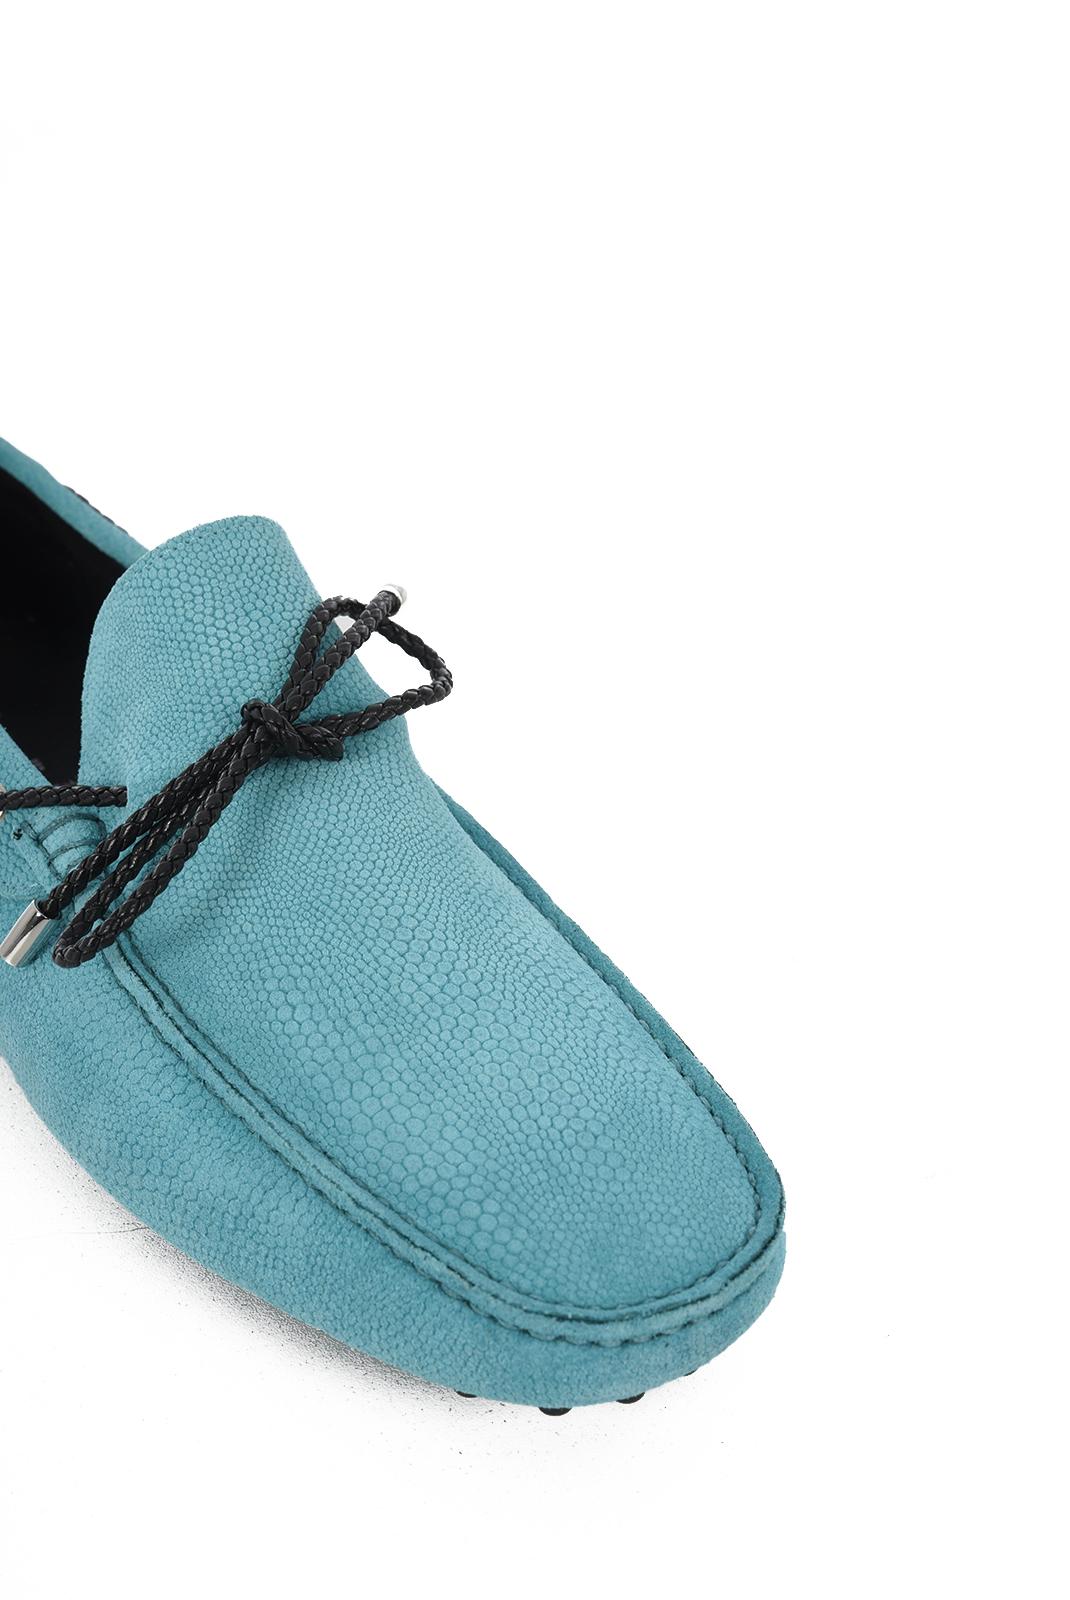 Chaussures de ville  Just Cavalli S12WR0035 (08581) 556